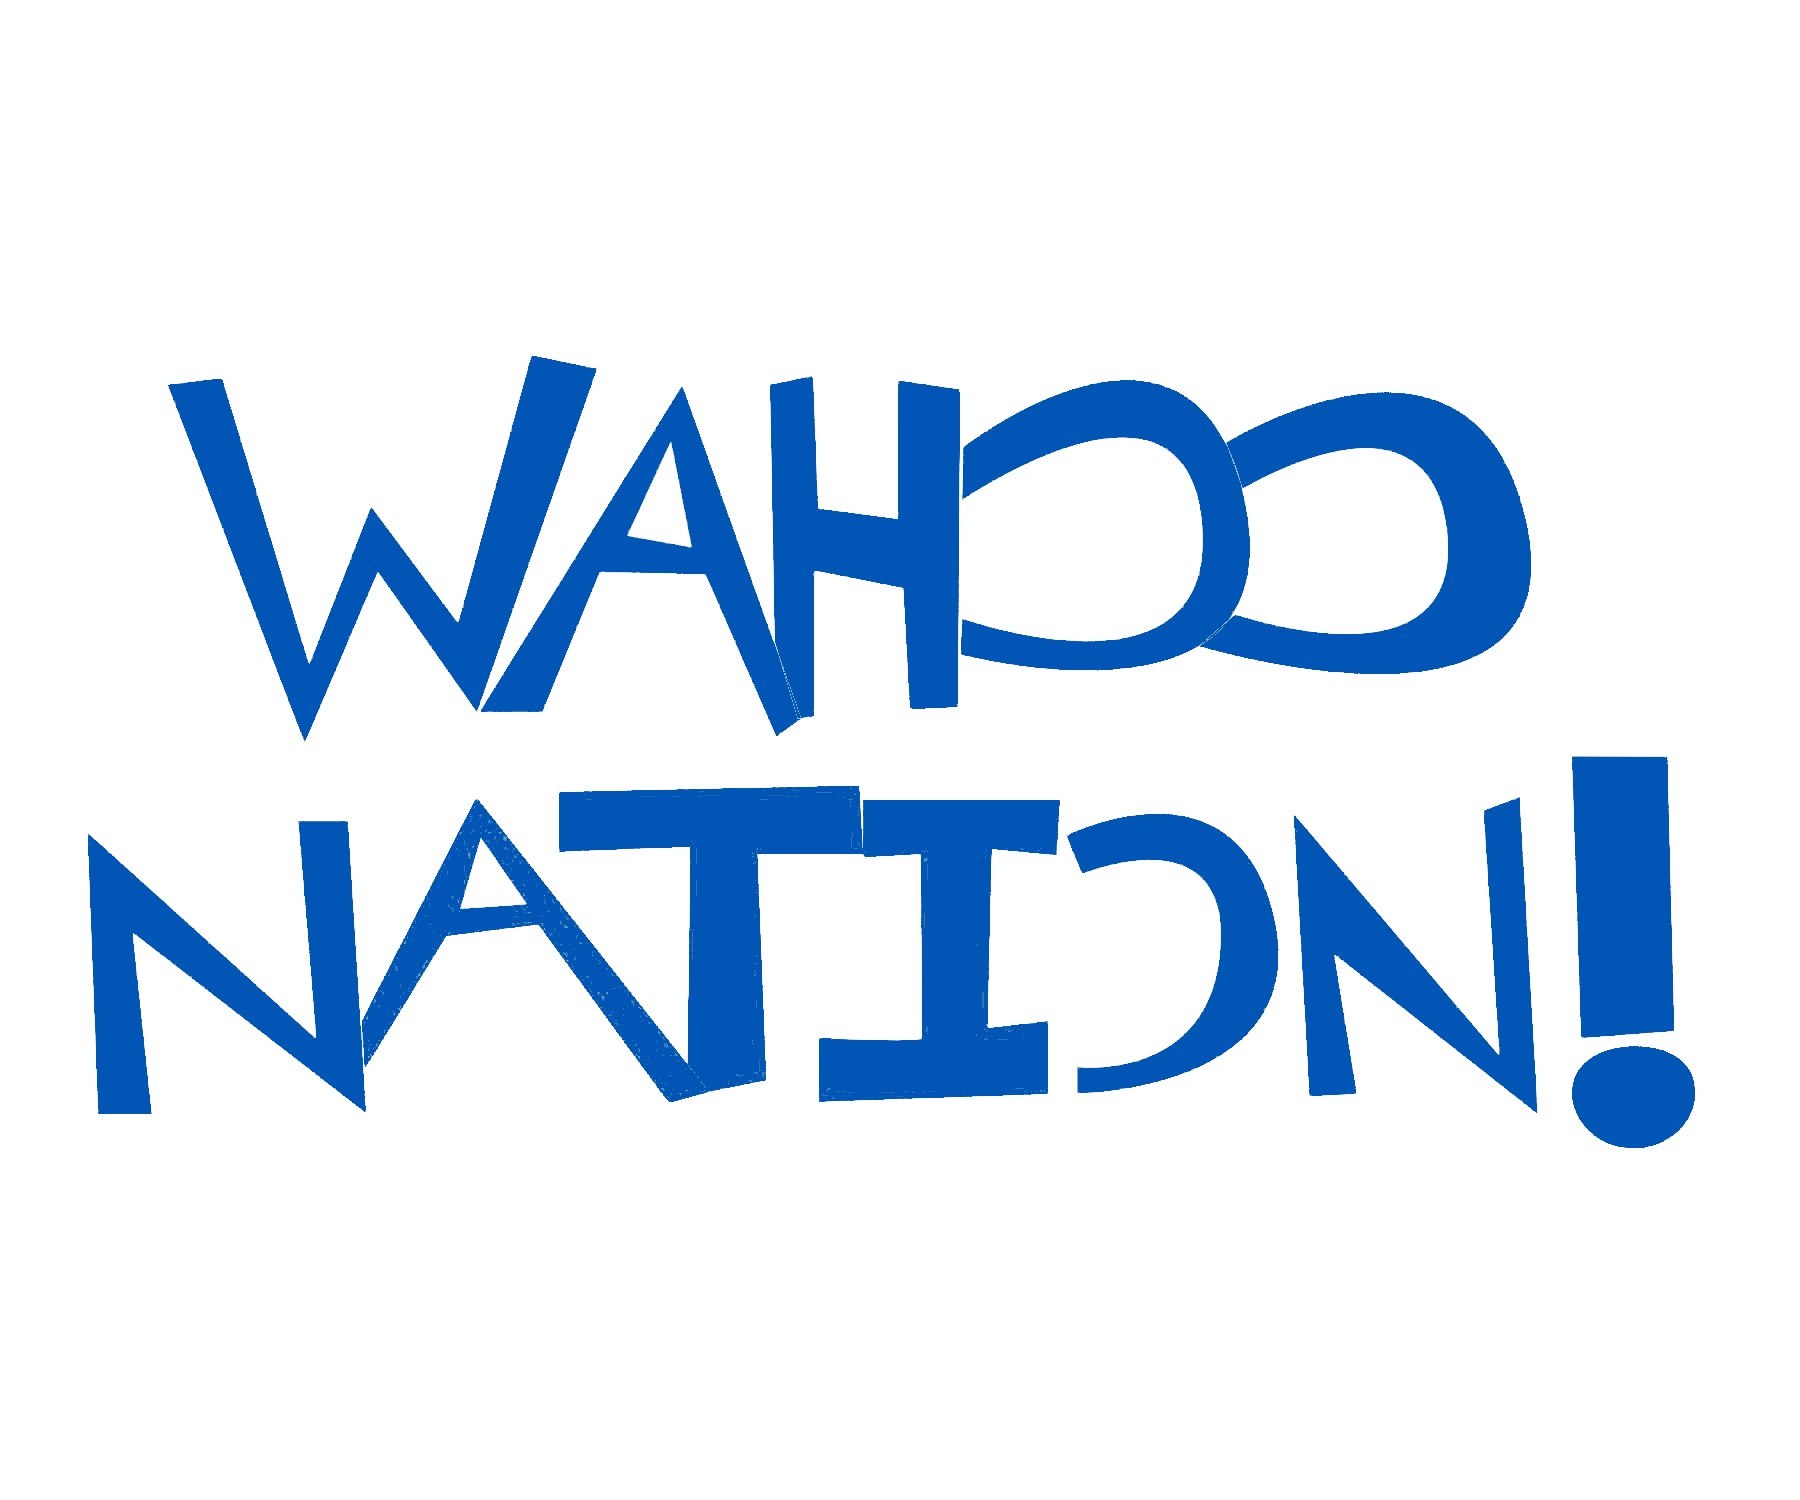 wahoo nation back of shirt jpg828282 cop36363y